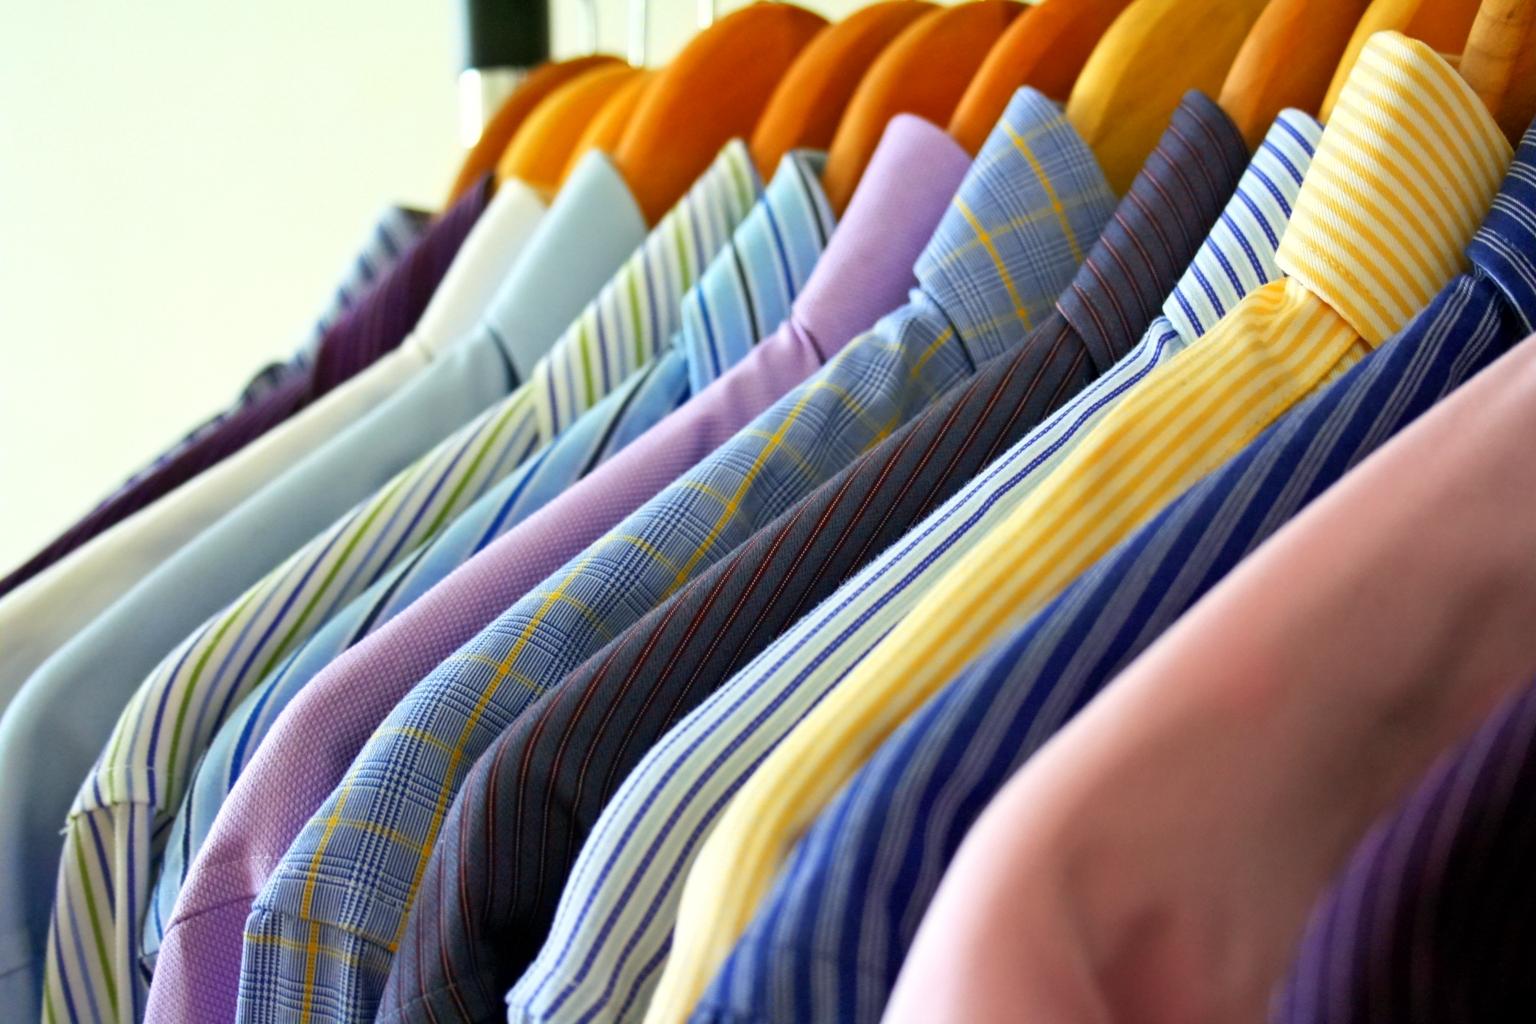 Wallpaper : life, shirt, wooden, still, colours, clothes ...